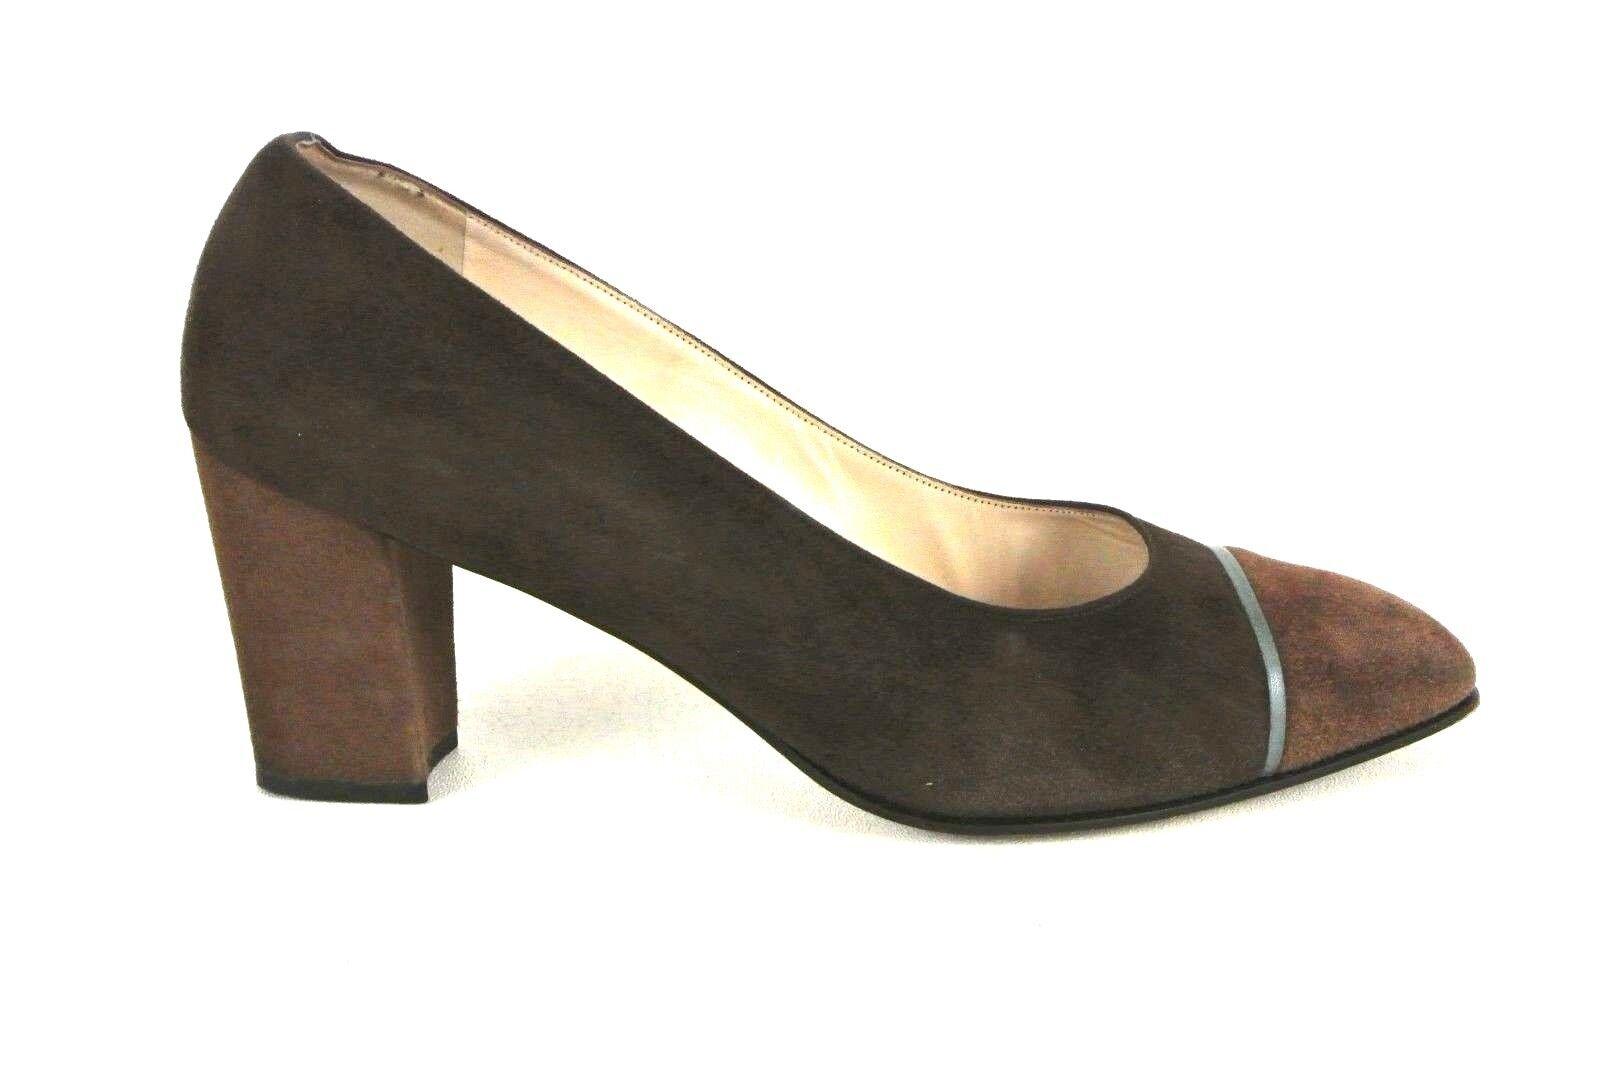 Bellezza Bally Heels Brown Suede Pumps EU 6 US 8.5 Made In Switzerland 1008